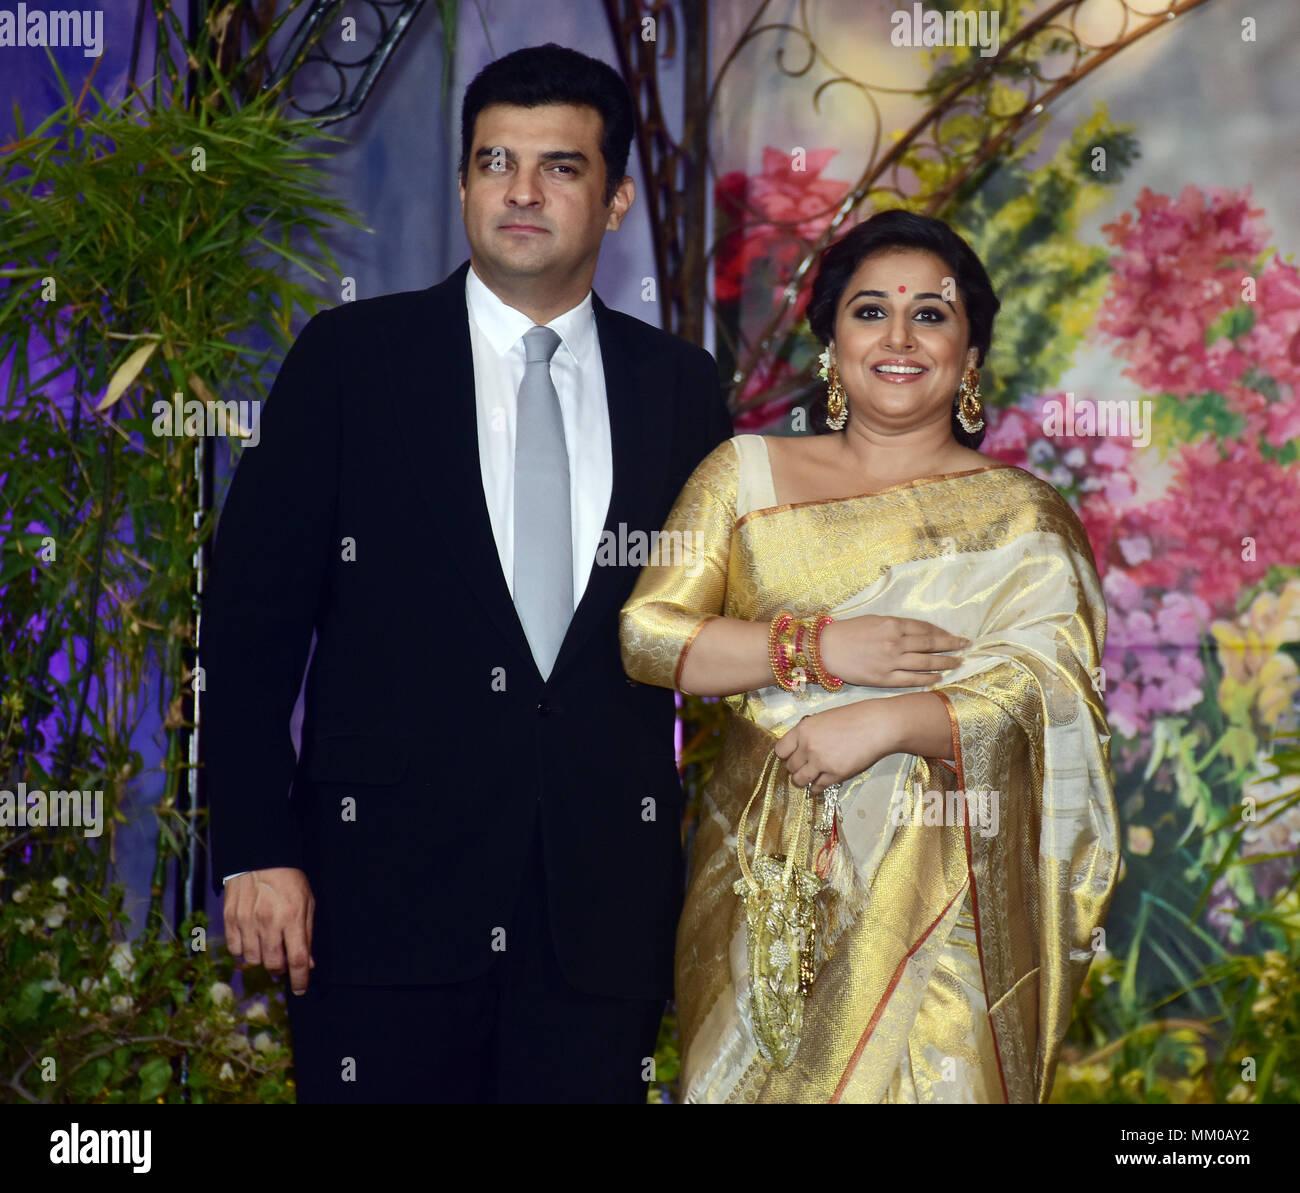 Indian Film Actress Vidya Balan With Husband Siddharth Roy Kapoor